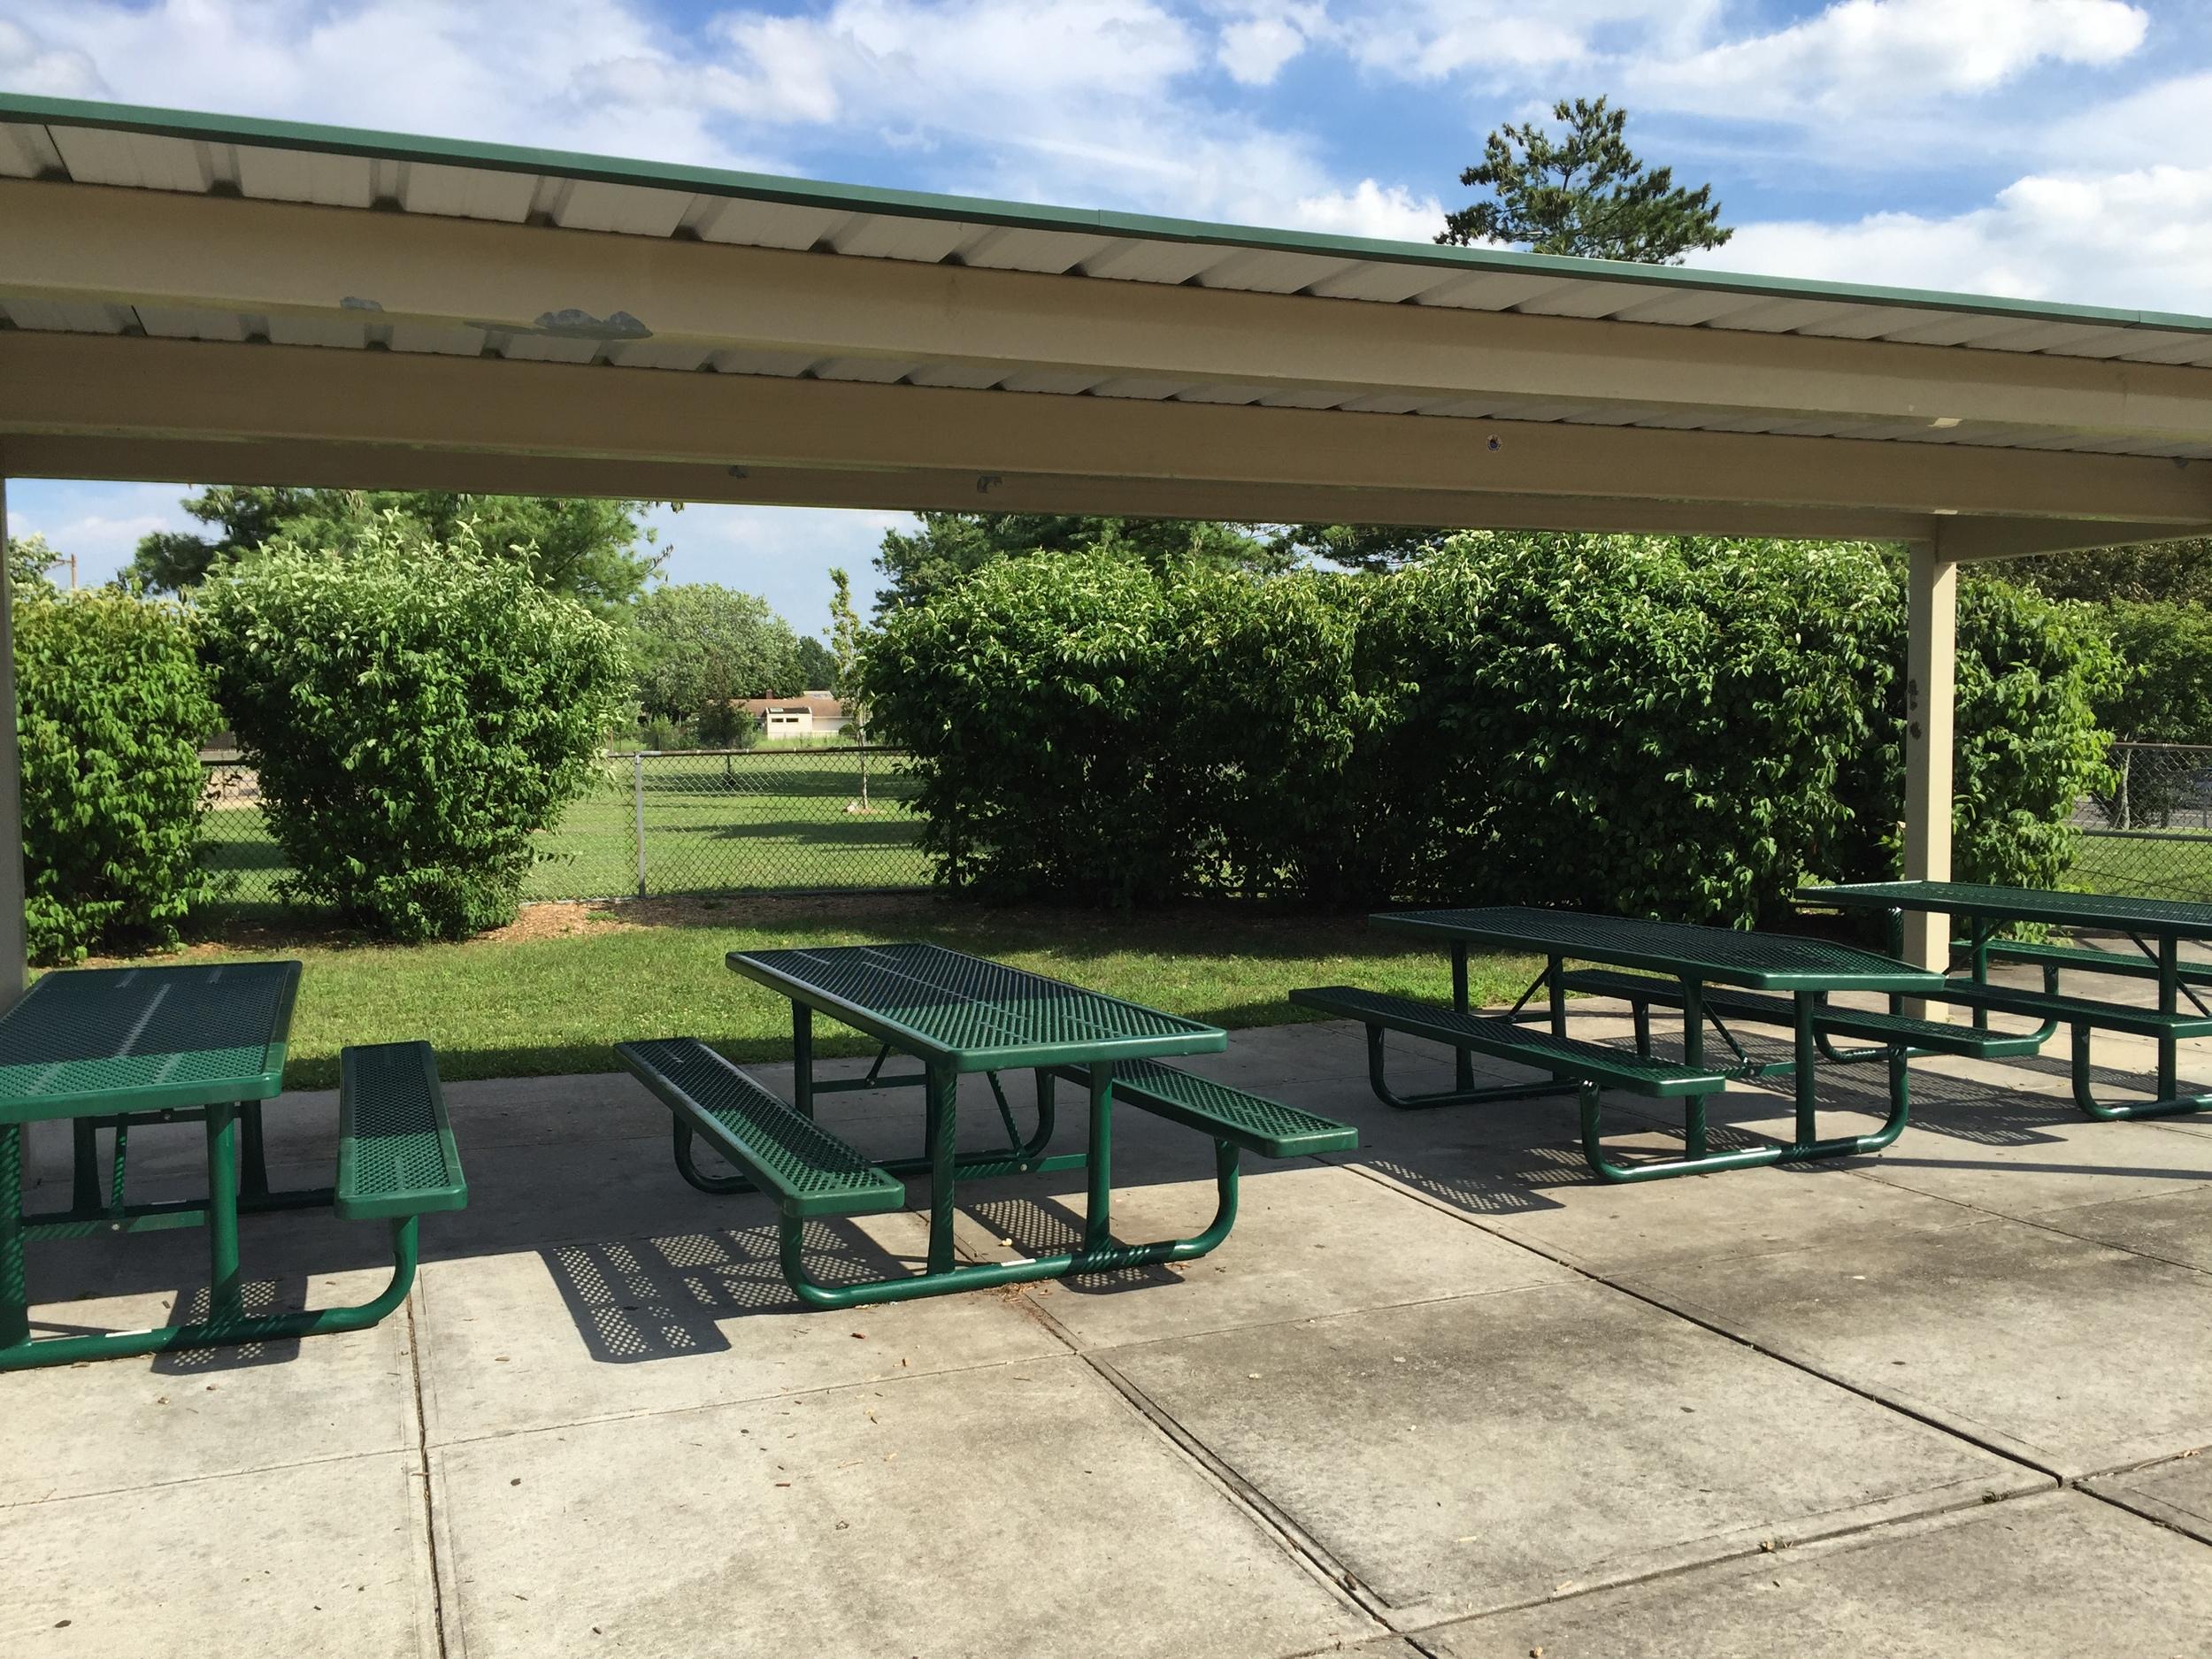 Picnic tables at Senator Speno Park